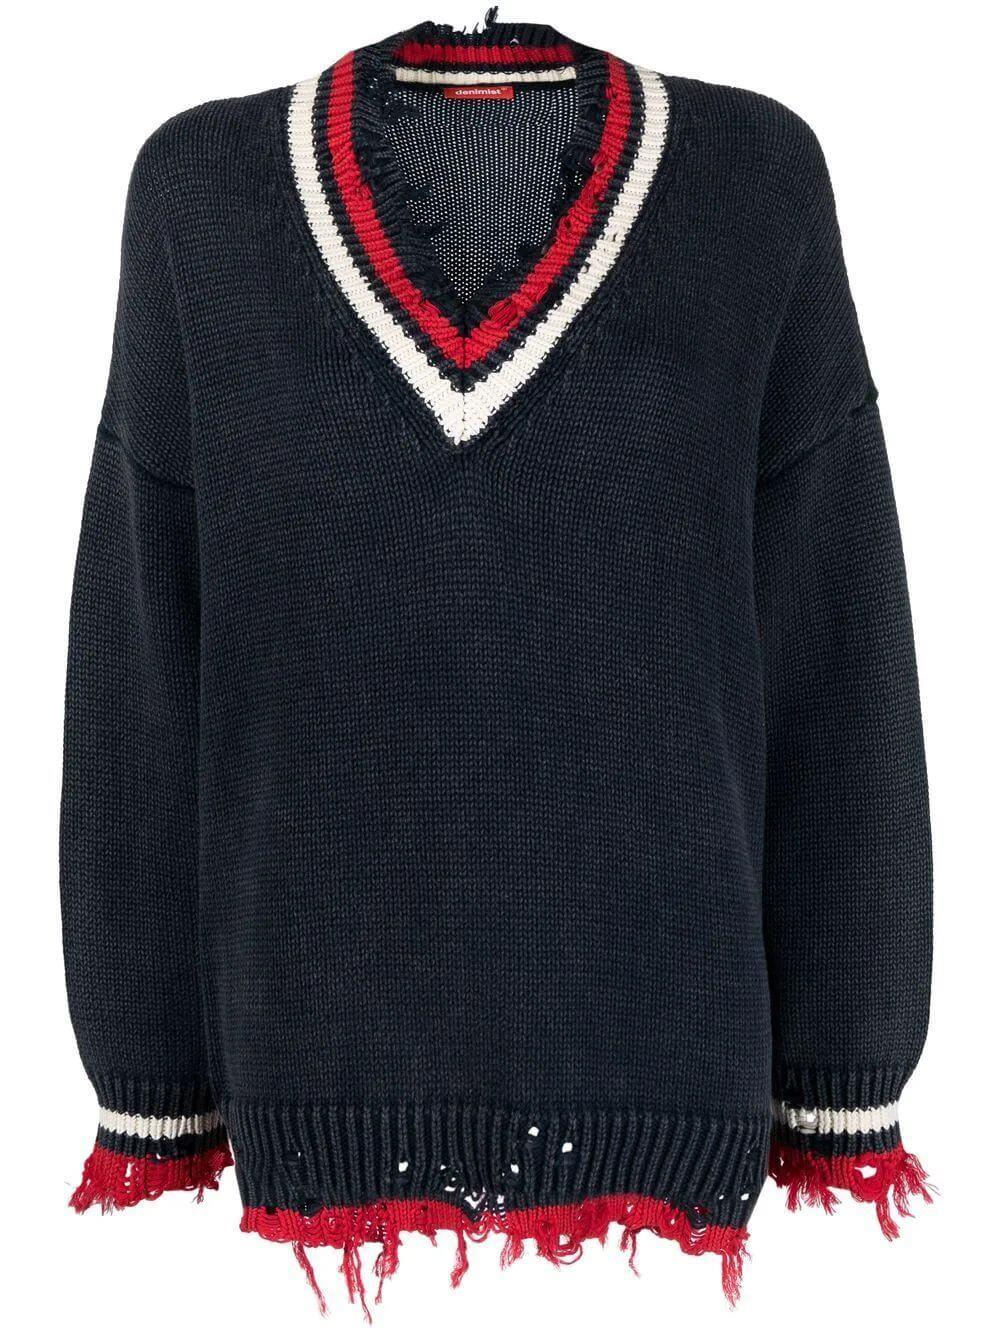 Oversized Tennis Sweater Item # DSWWY025-Y005A